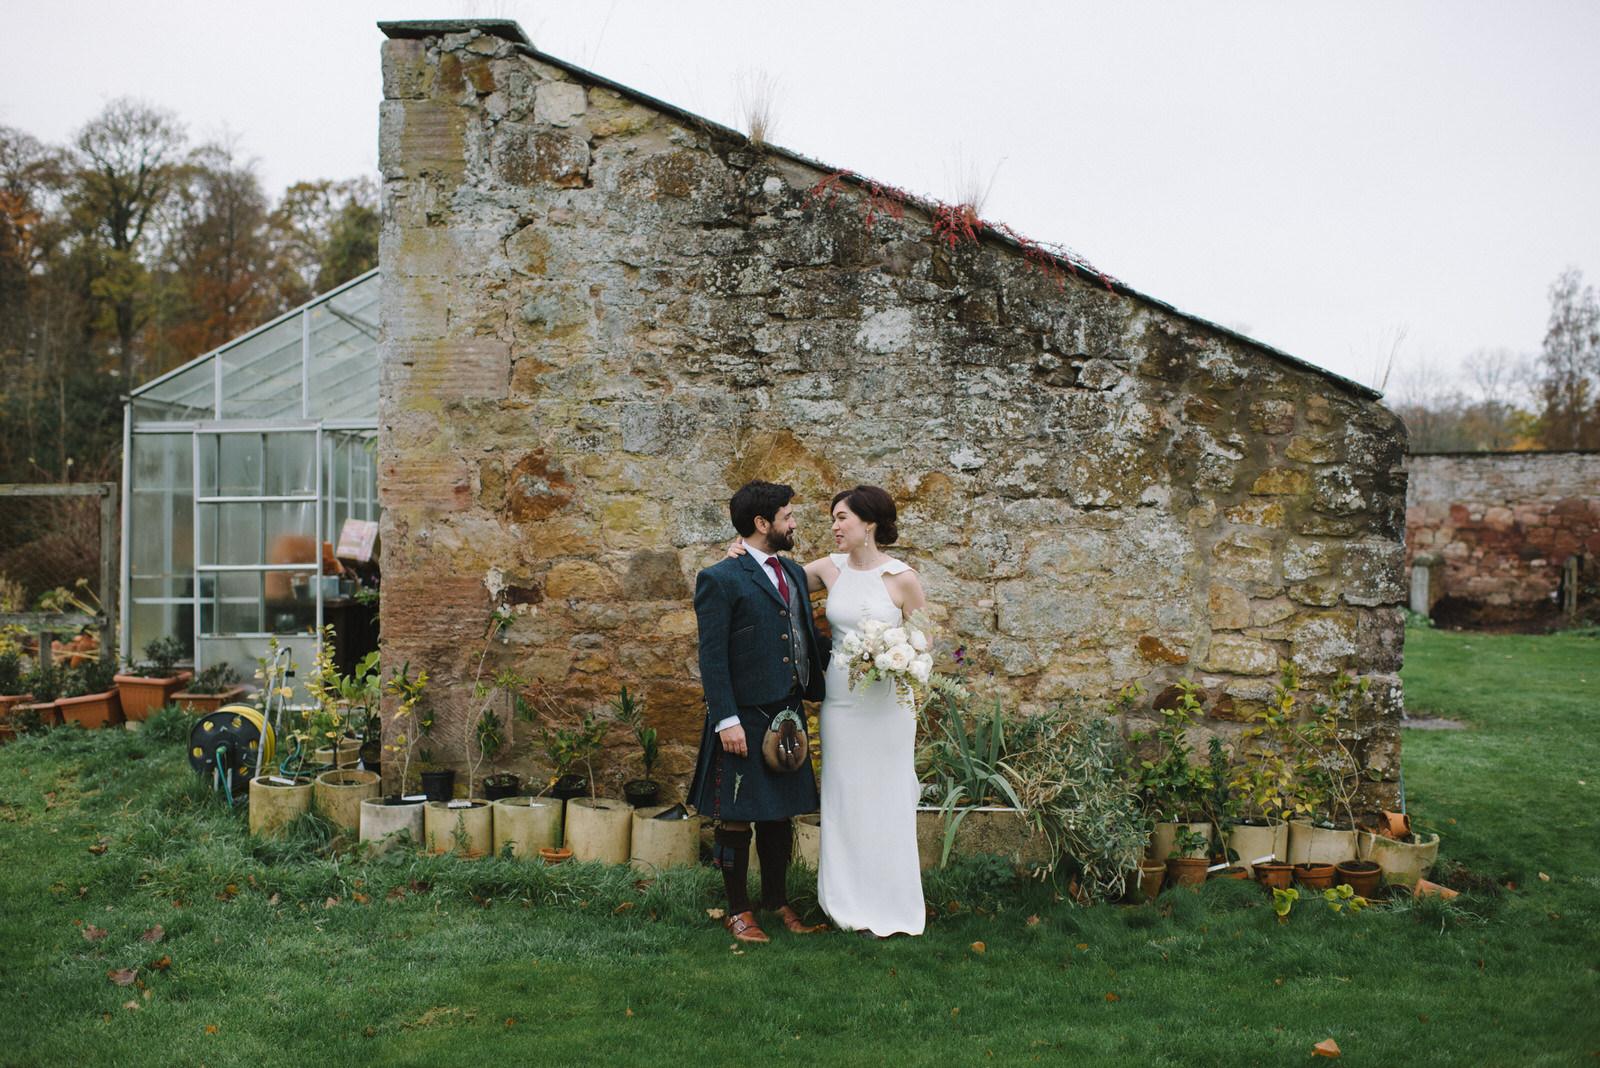 021-COLSTOUN-HOUSE-WEDDING-ALTERNATIVE-WEDDING-PHOTOGRAPHER-GLASGOW-WEDDING-PHOTOGRAPHER-STYLISH-SCOTTISH-WEDDING.JPG